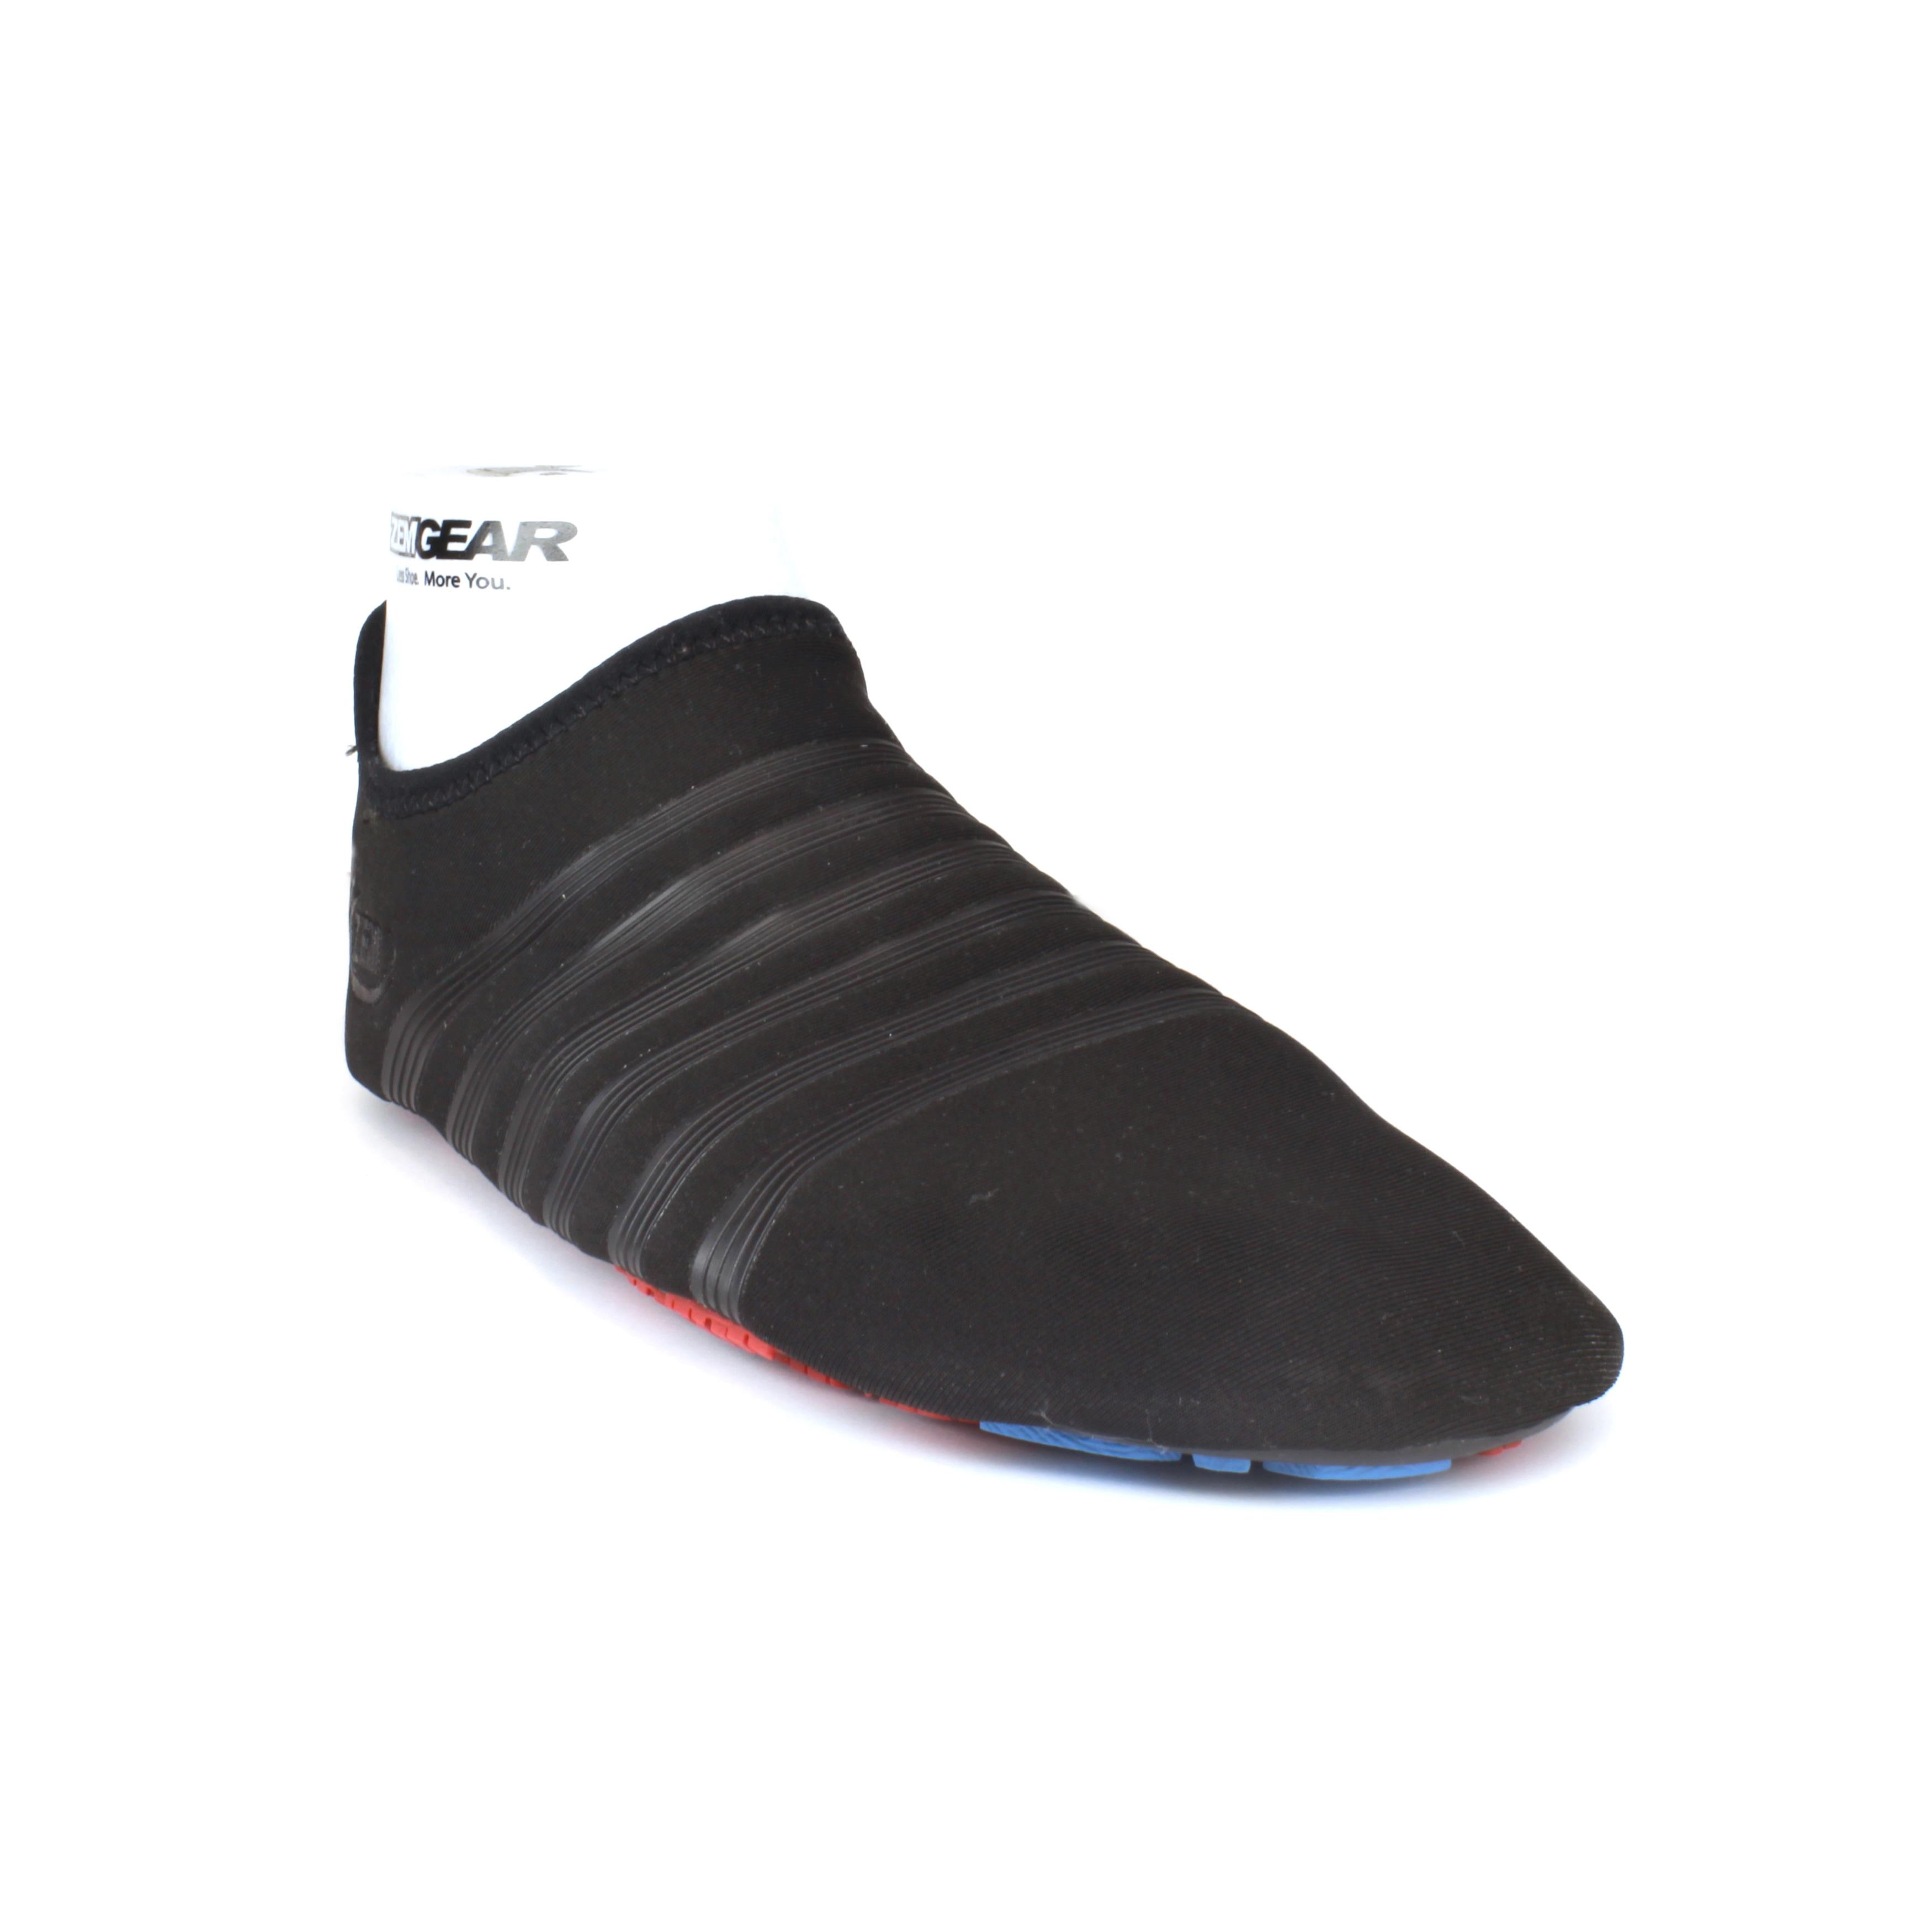 ZEMgear-Oxygen-2-Black-Athletic-Shoes-c111e42d-5886-4f52-82ba